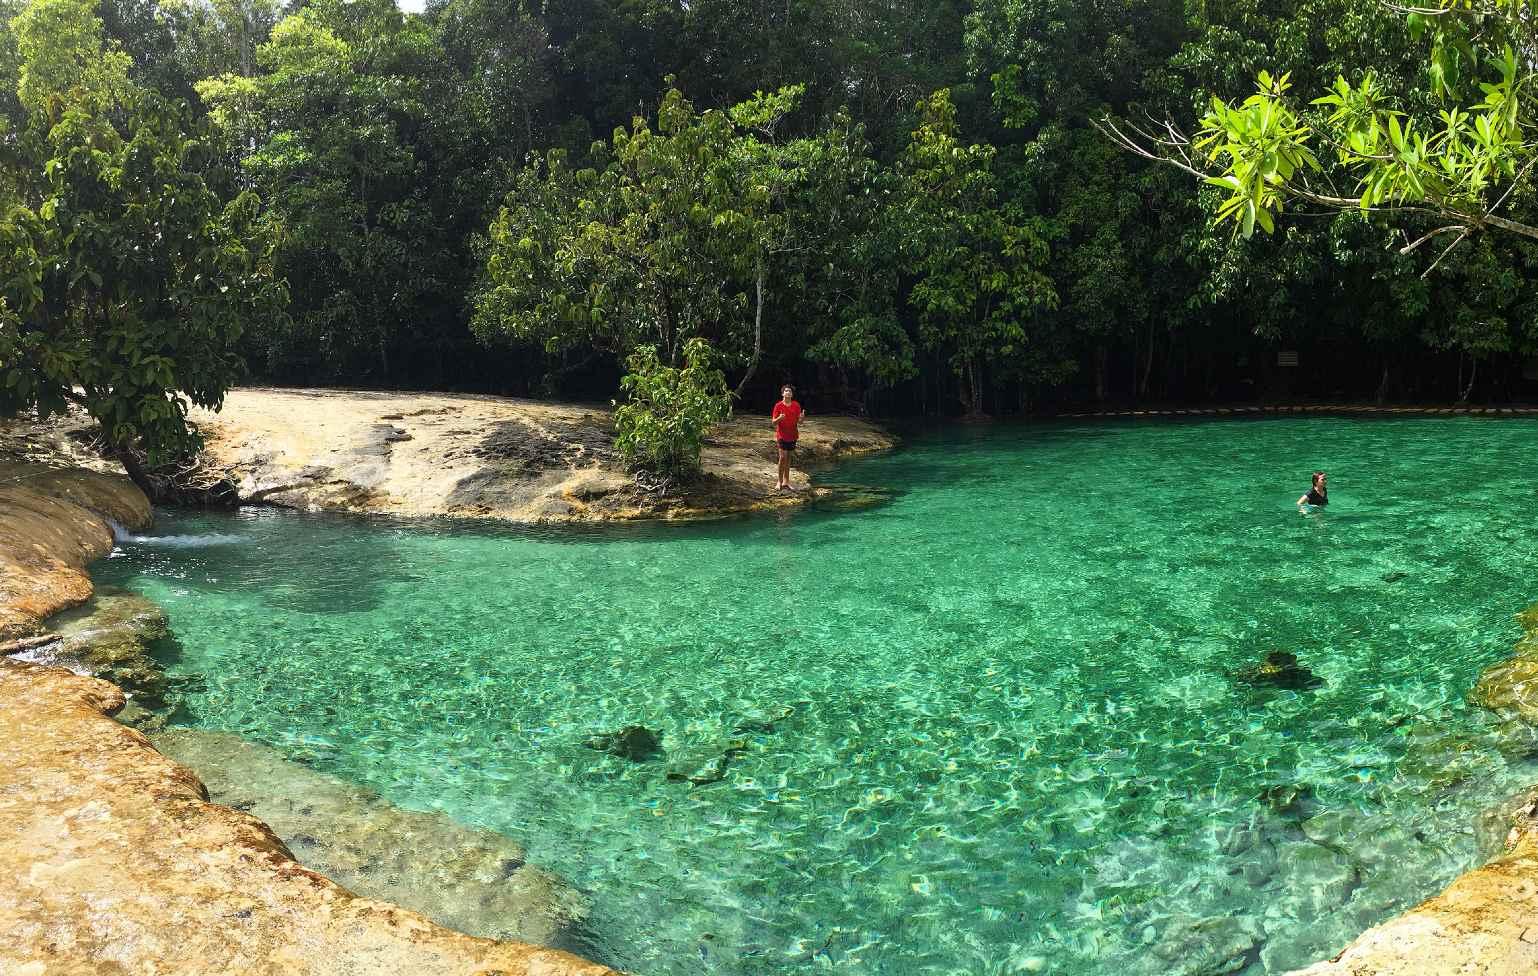 Smaragdgroene water van de Emerald Pool omringd met rotsen en jungle, Krabi